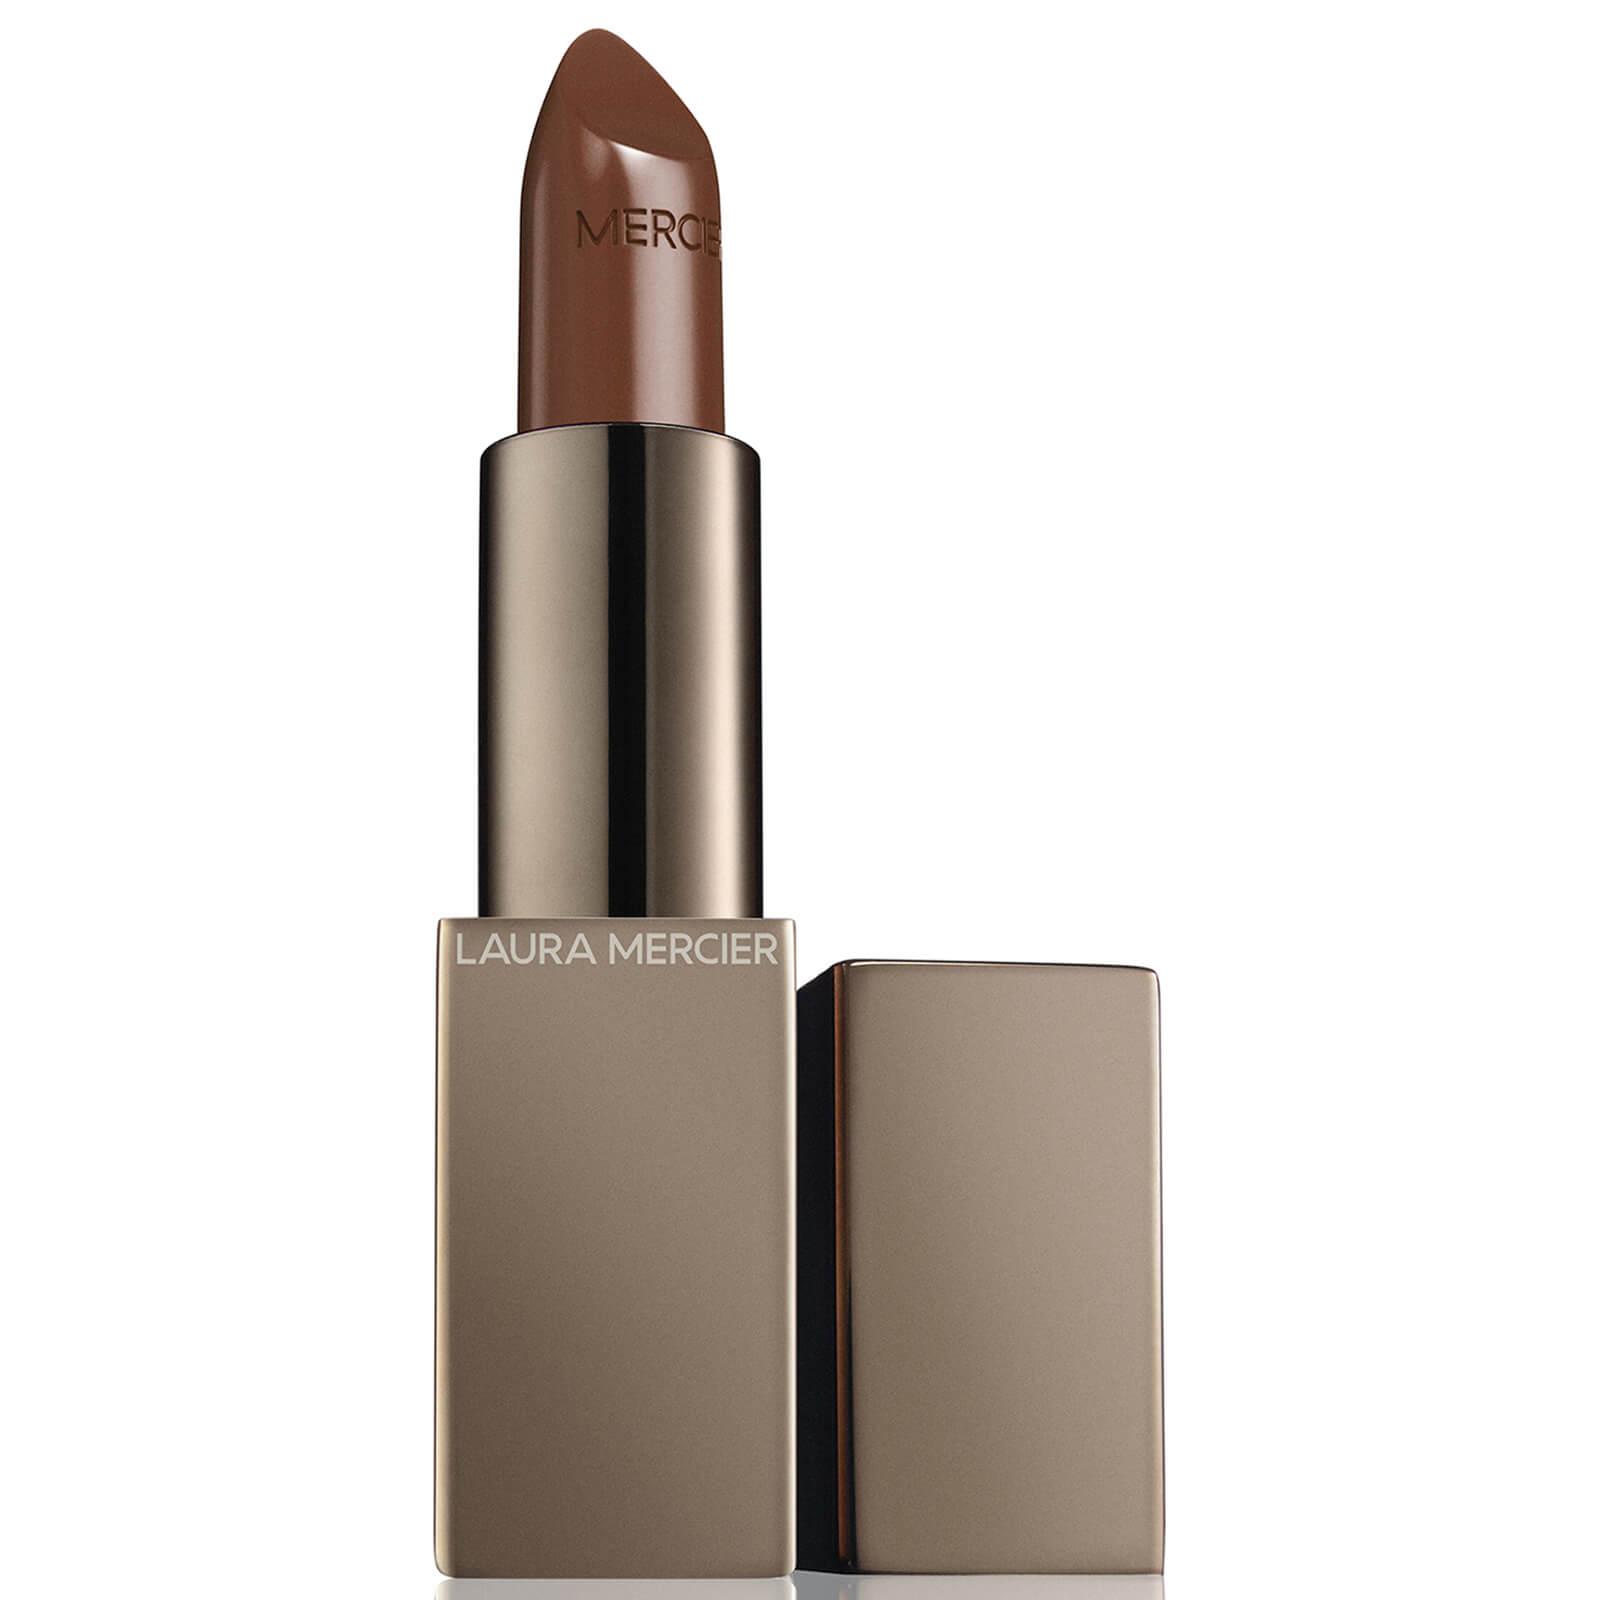 Laura Mercier Rouge Essentiel Silky Crème Lipstick 3.5g (Various Shades) - Brun Naturel